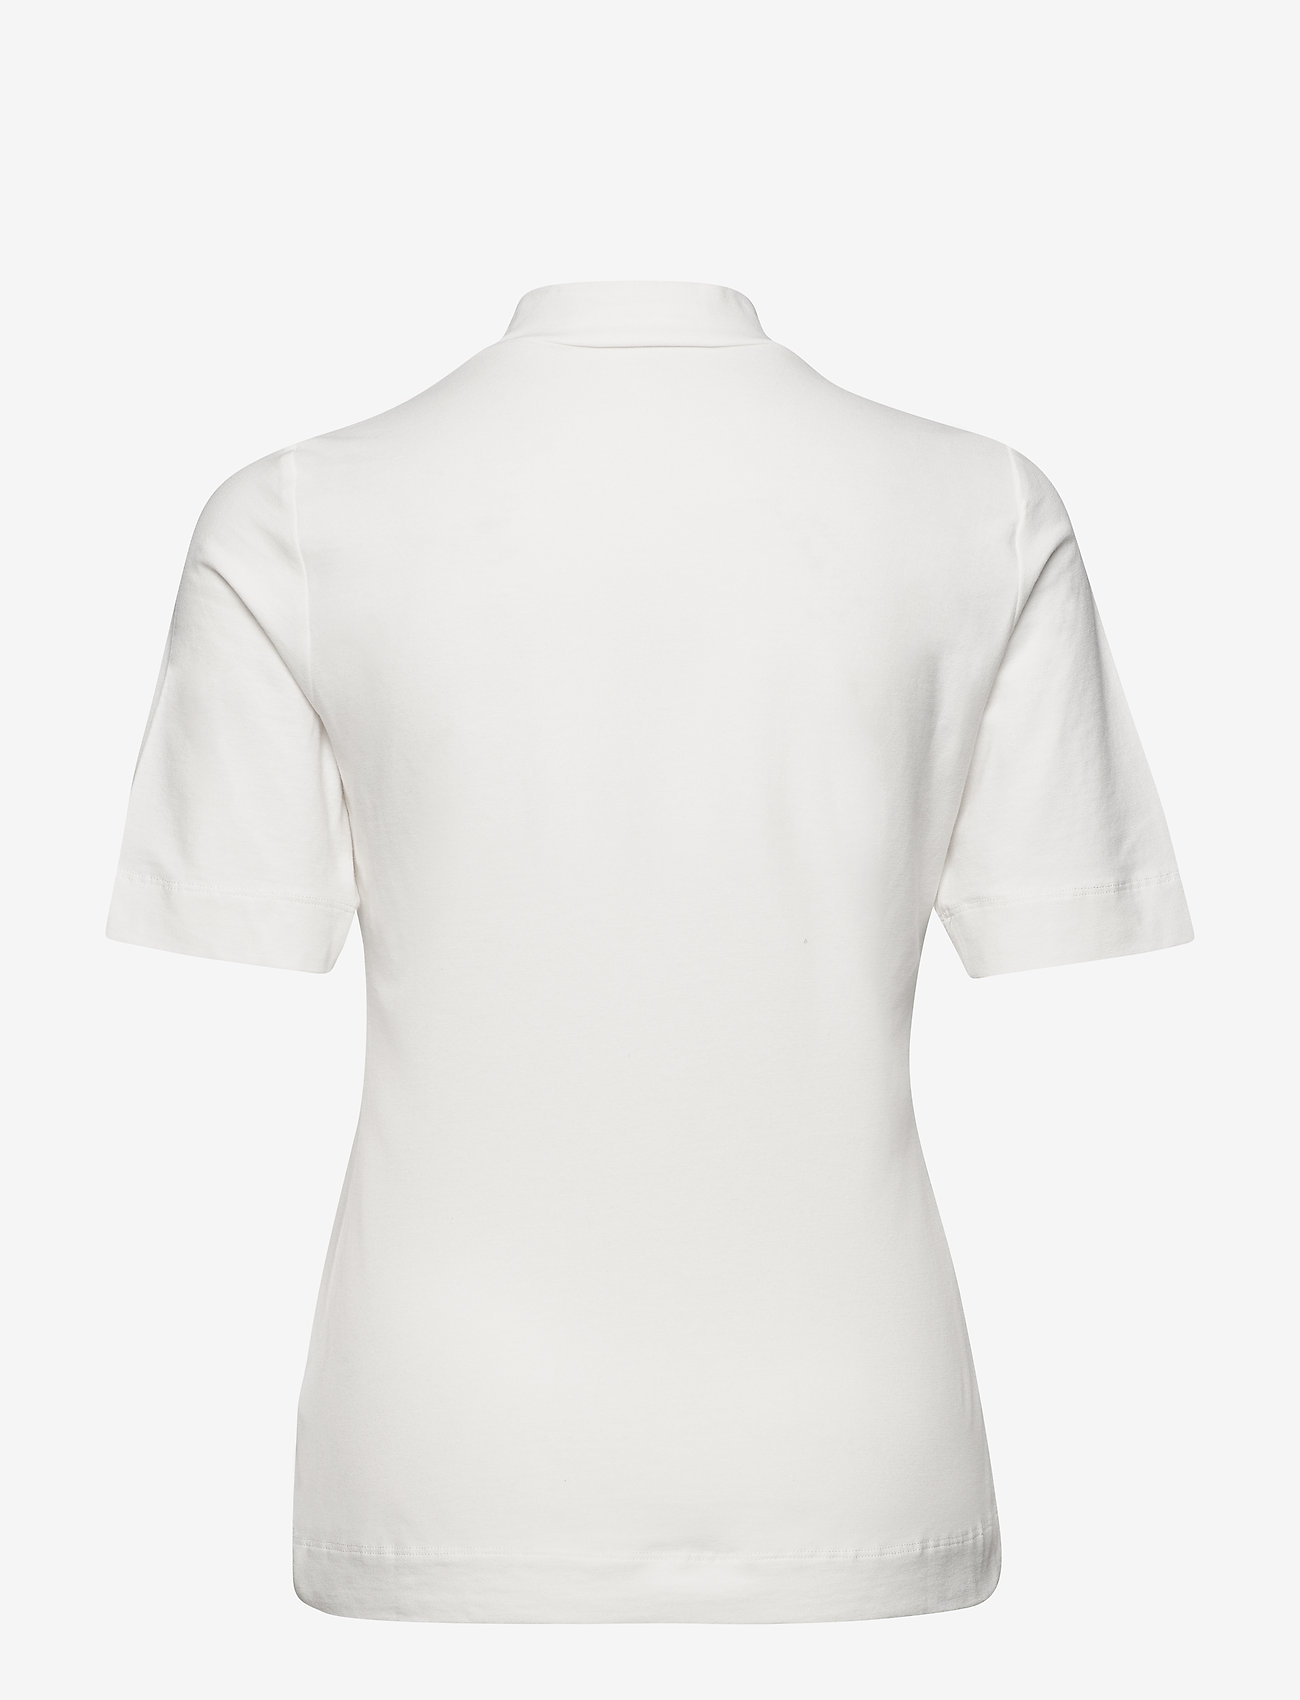 InWear FondaIW Turtleneck SS - T-shirts & topper WHITE SMOKE - Dameklær Spesialtilbud